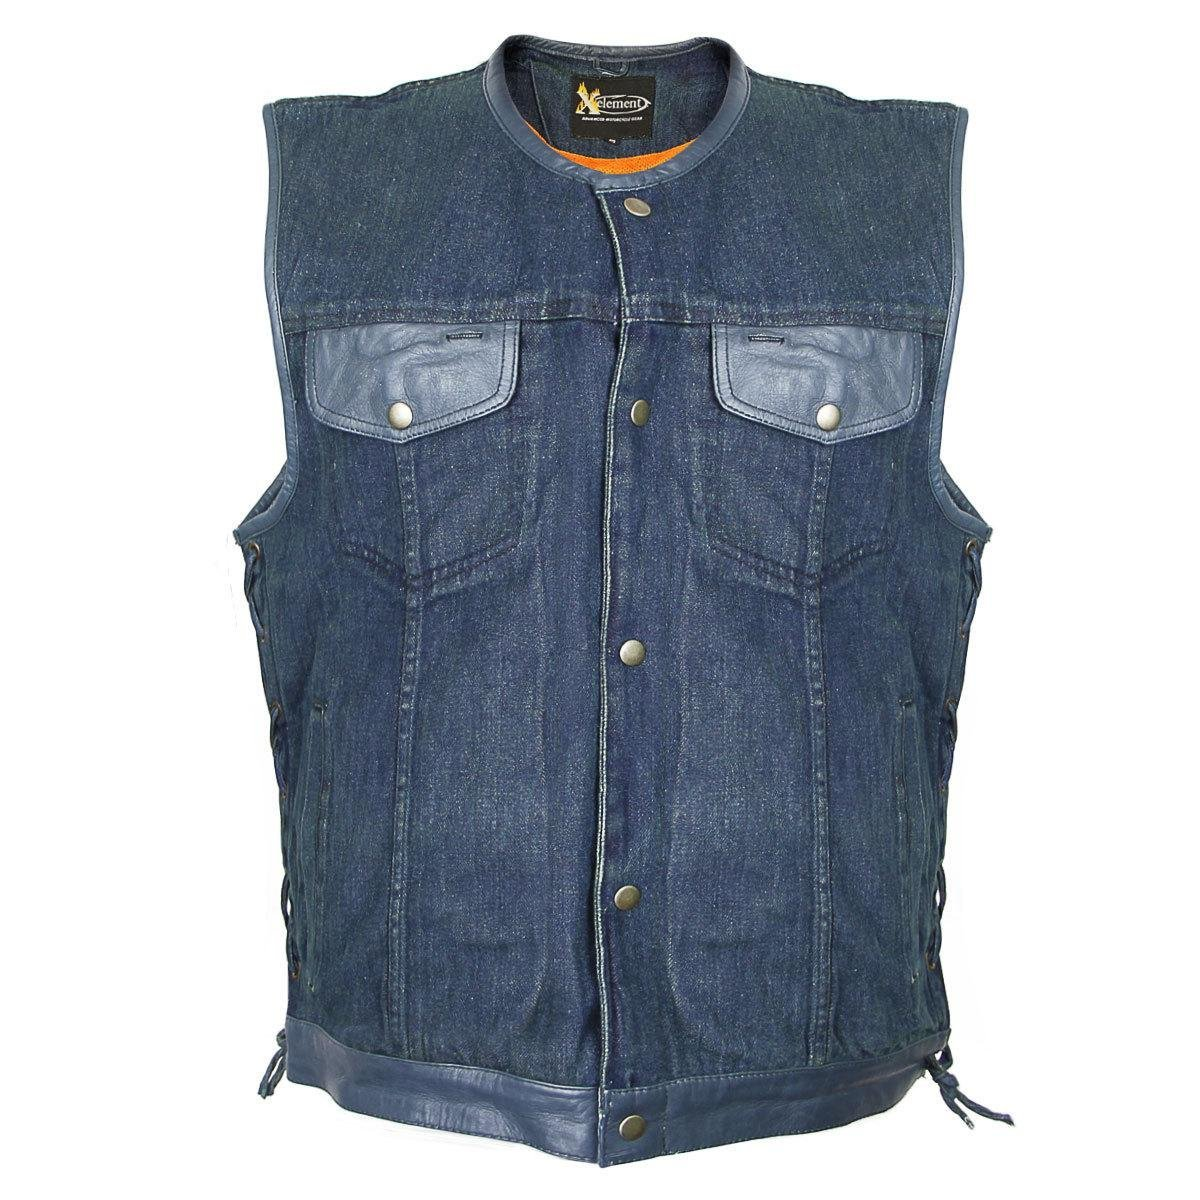 Xelement Mens Blue Denim Lace Gun Pocket Vest - Medium